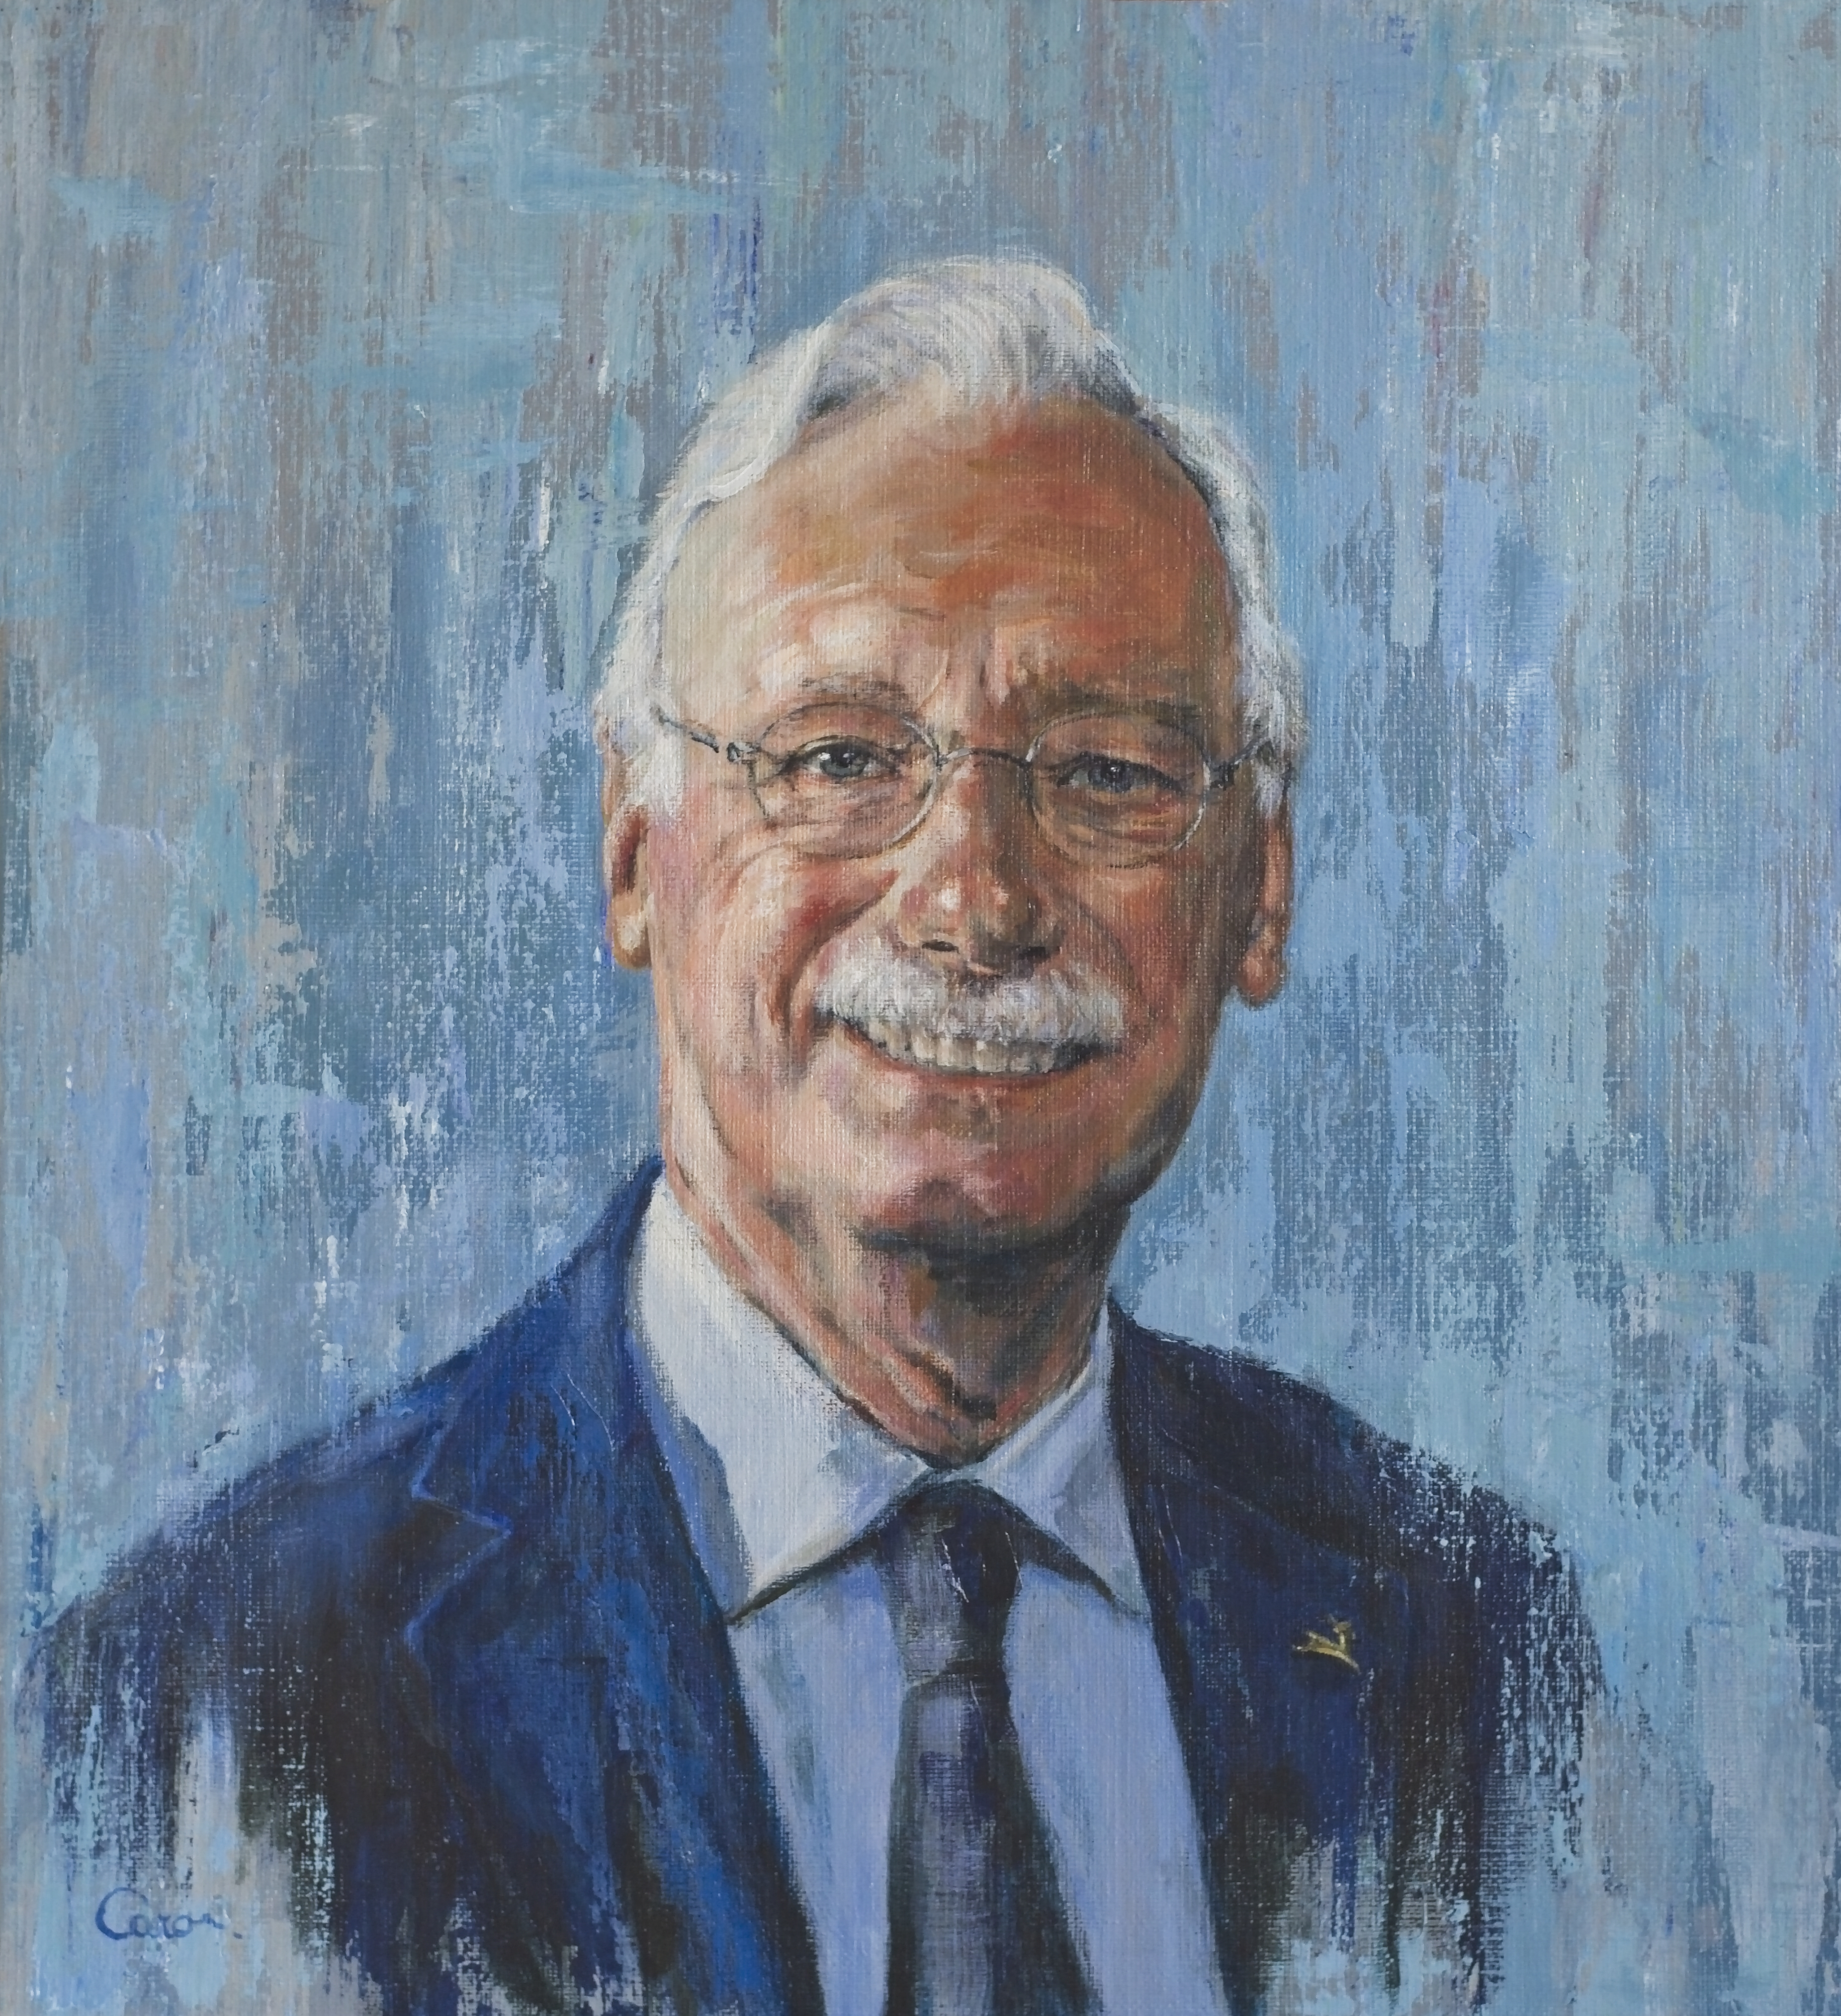 Burgemeester Van Der Hoeve